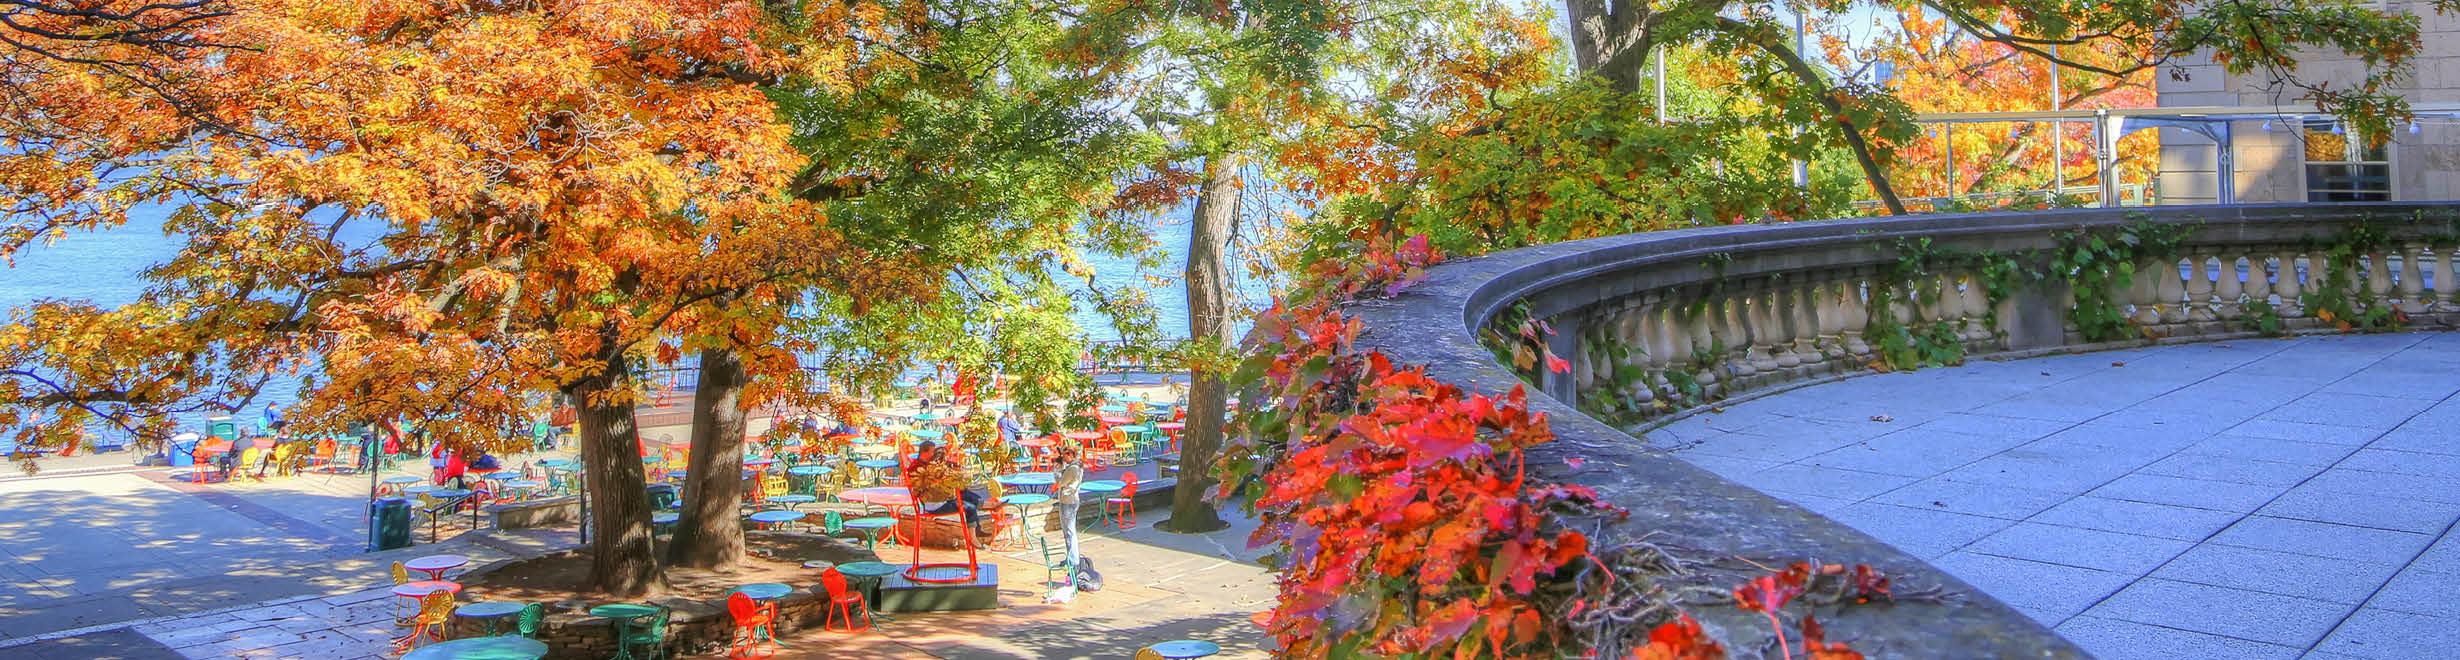 Memorial Union Terrace in Fall